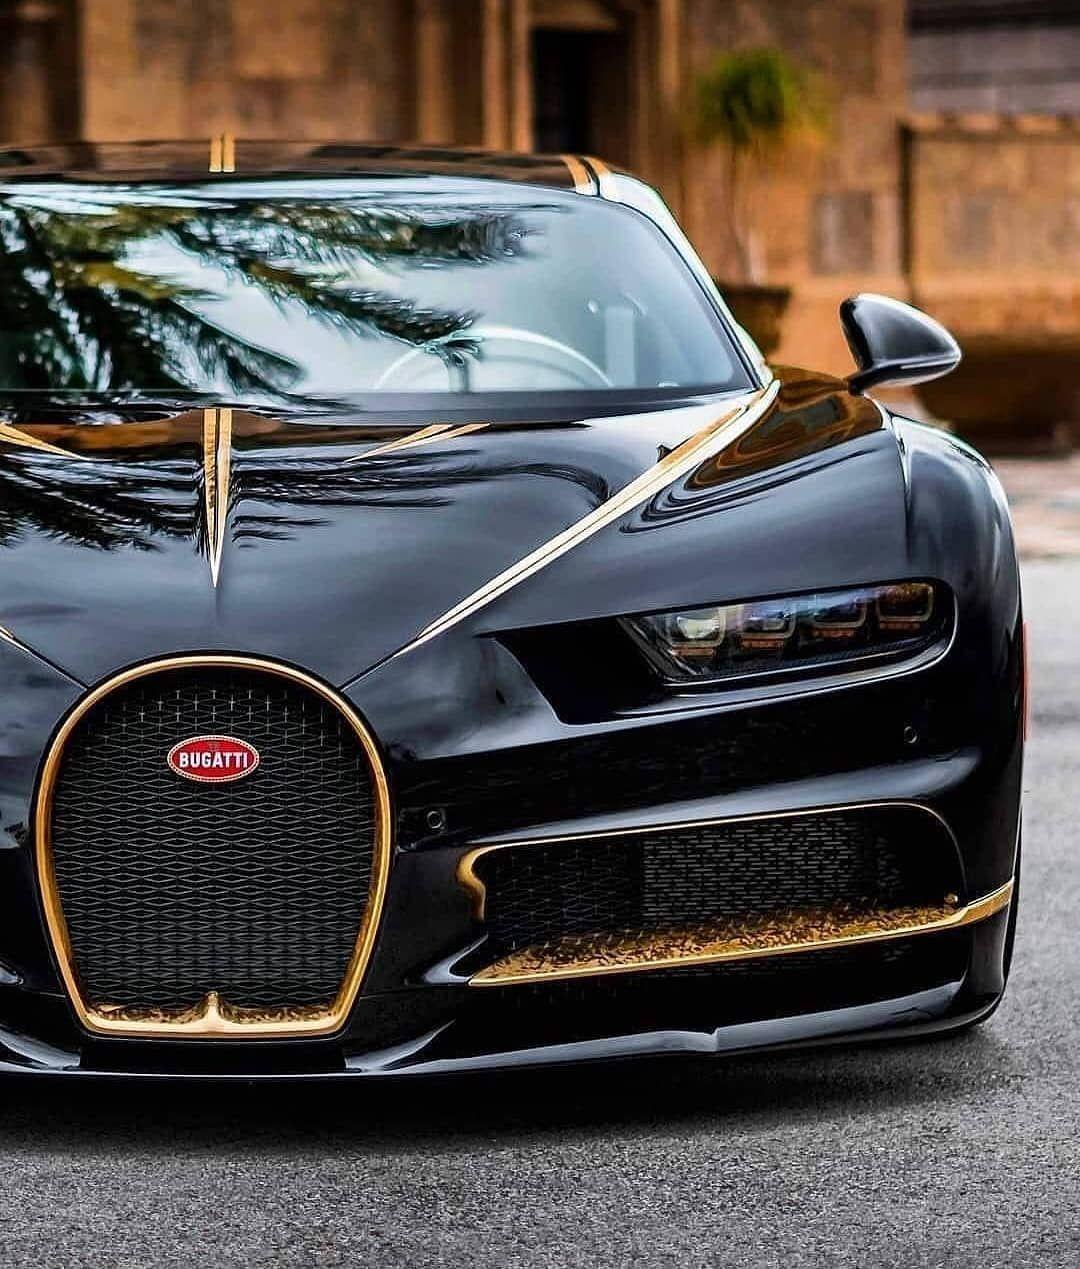 Hyper Nbsp Nbsp Bugatti Nbsp Nbsp Nbsp Nbsp Bugatti Nbsp Nbsp Nbsp Nbsp Lamborghini Nbsp Nbsp Nbsp Nbsp Supercar Bugatti Veyron Bugatti